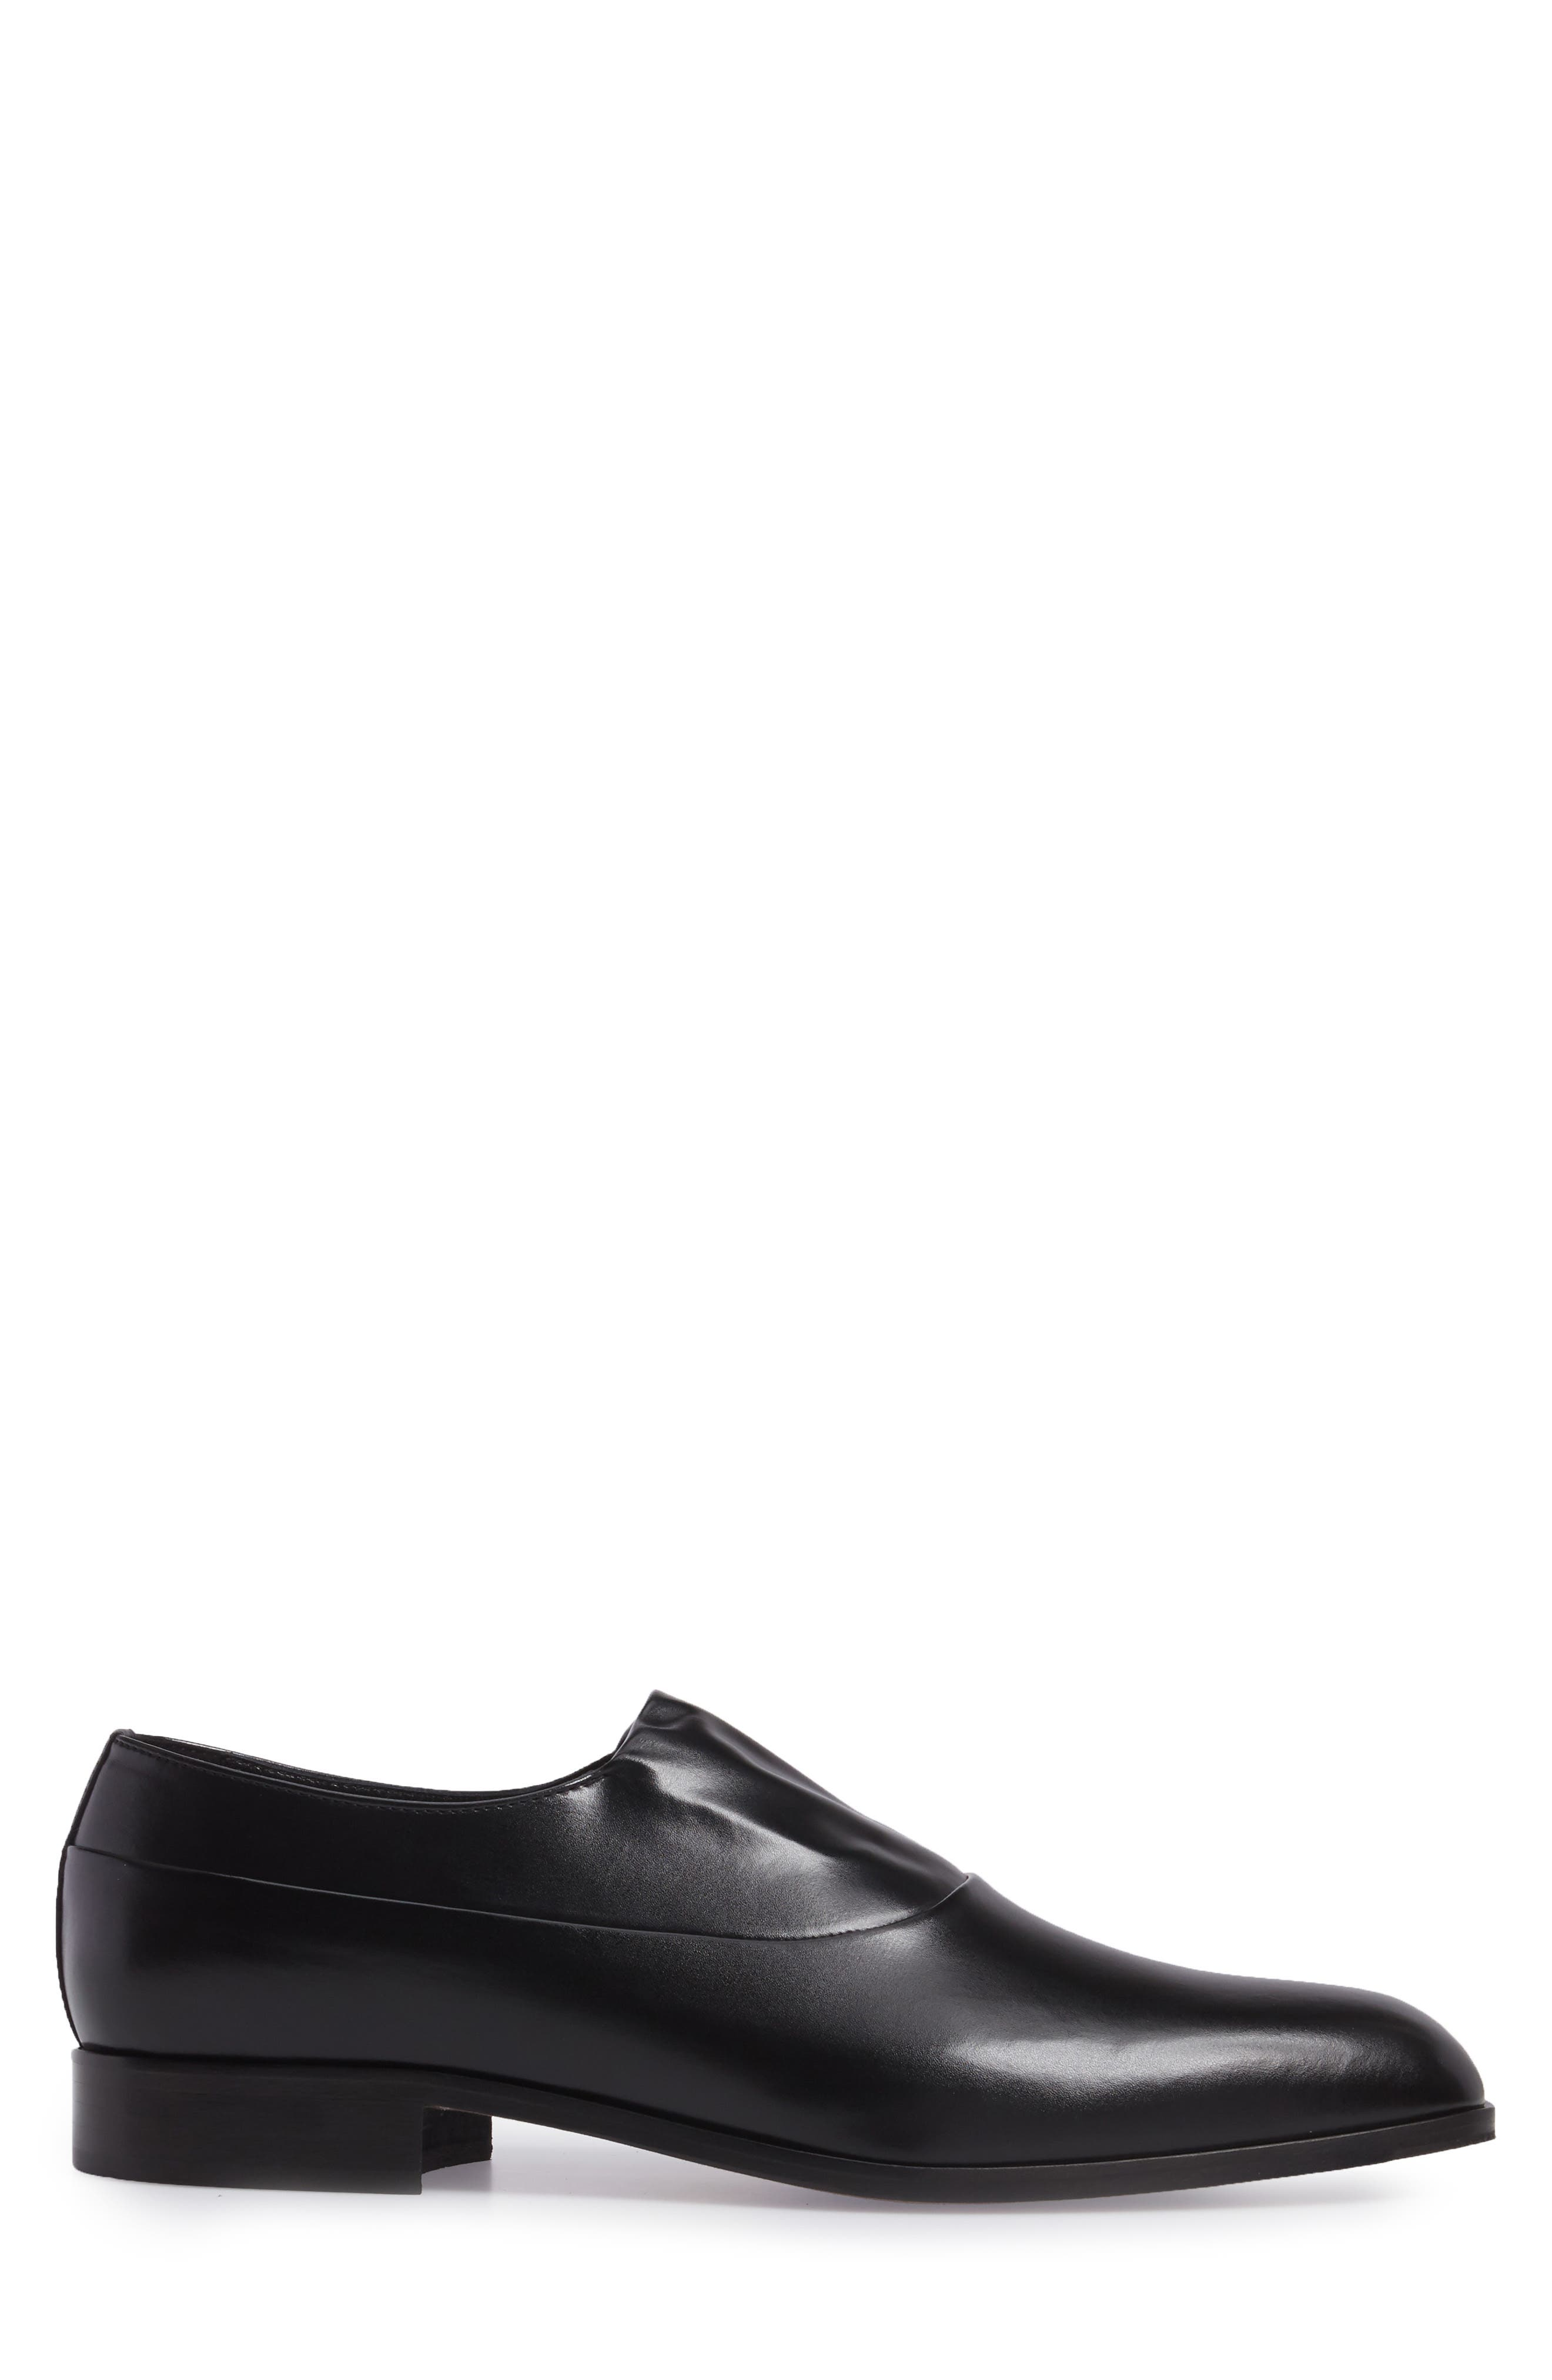 Marcio Venetian Loafer,                             Alternate thumbnail 3, color,                             Black